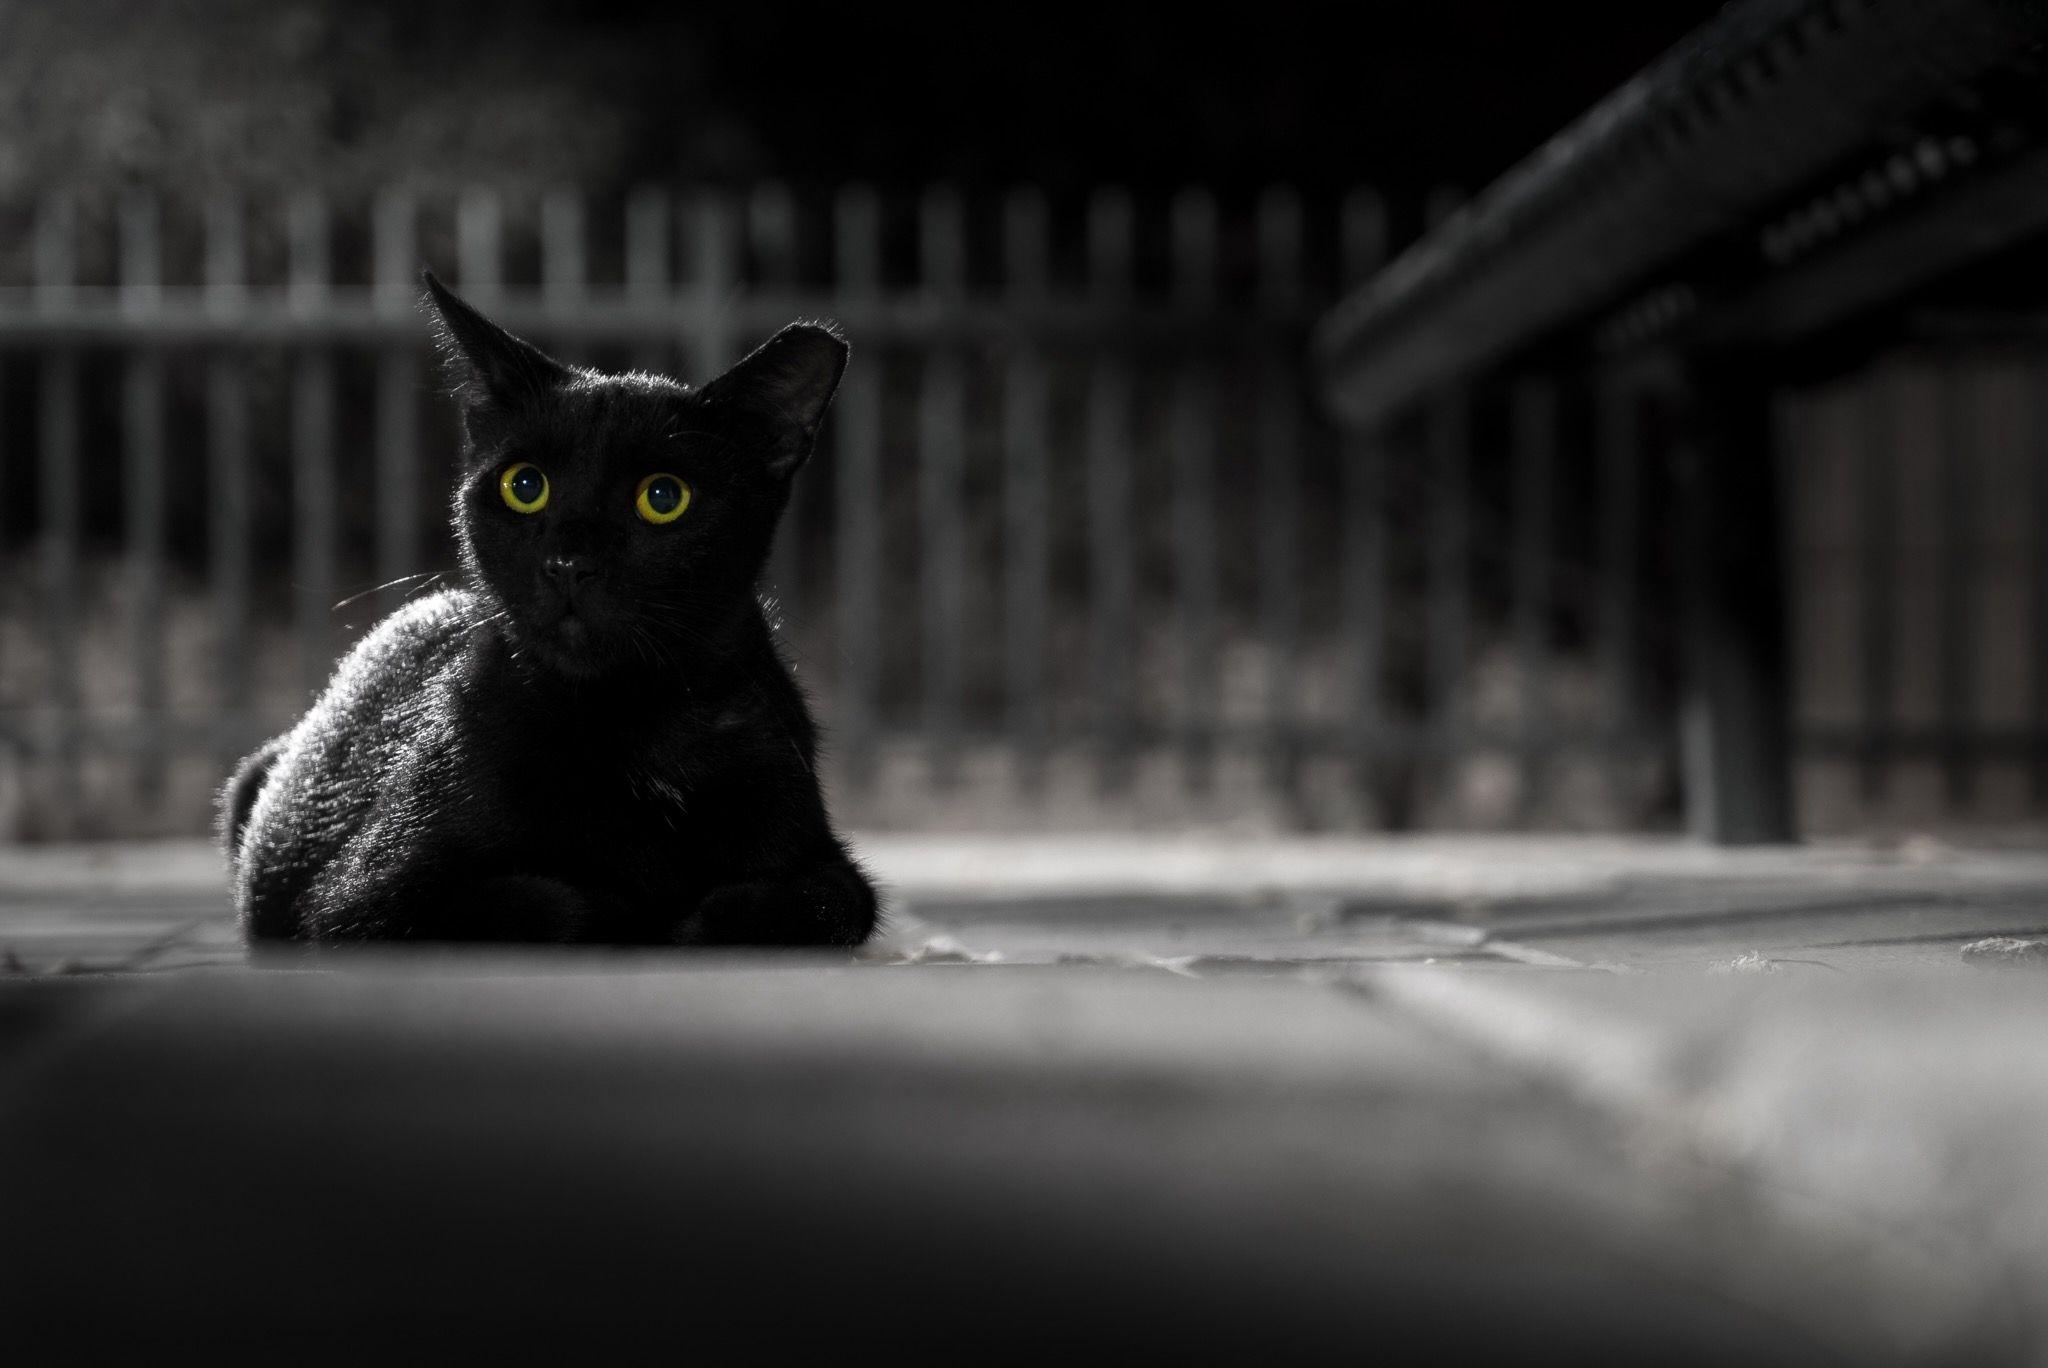 Unreliable Narrator In The Black Cat